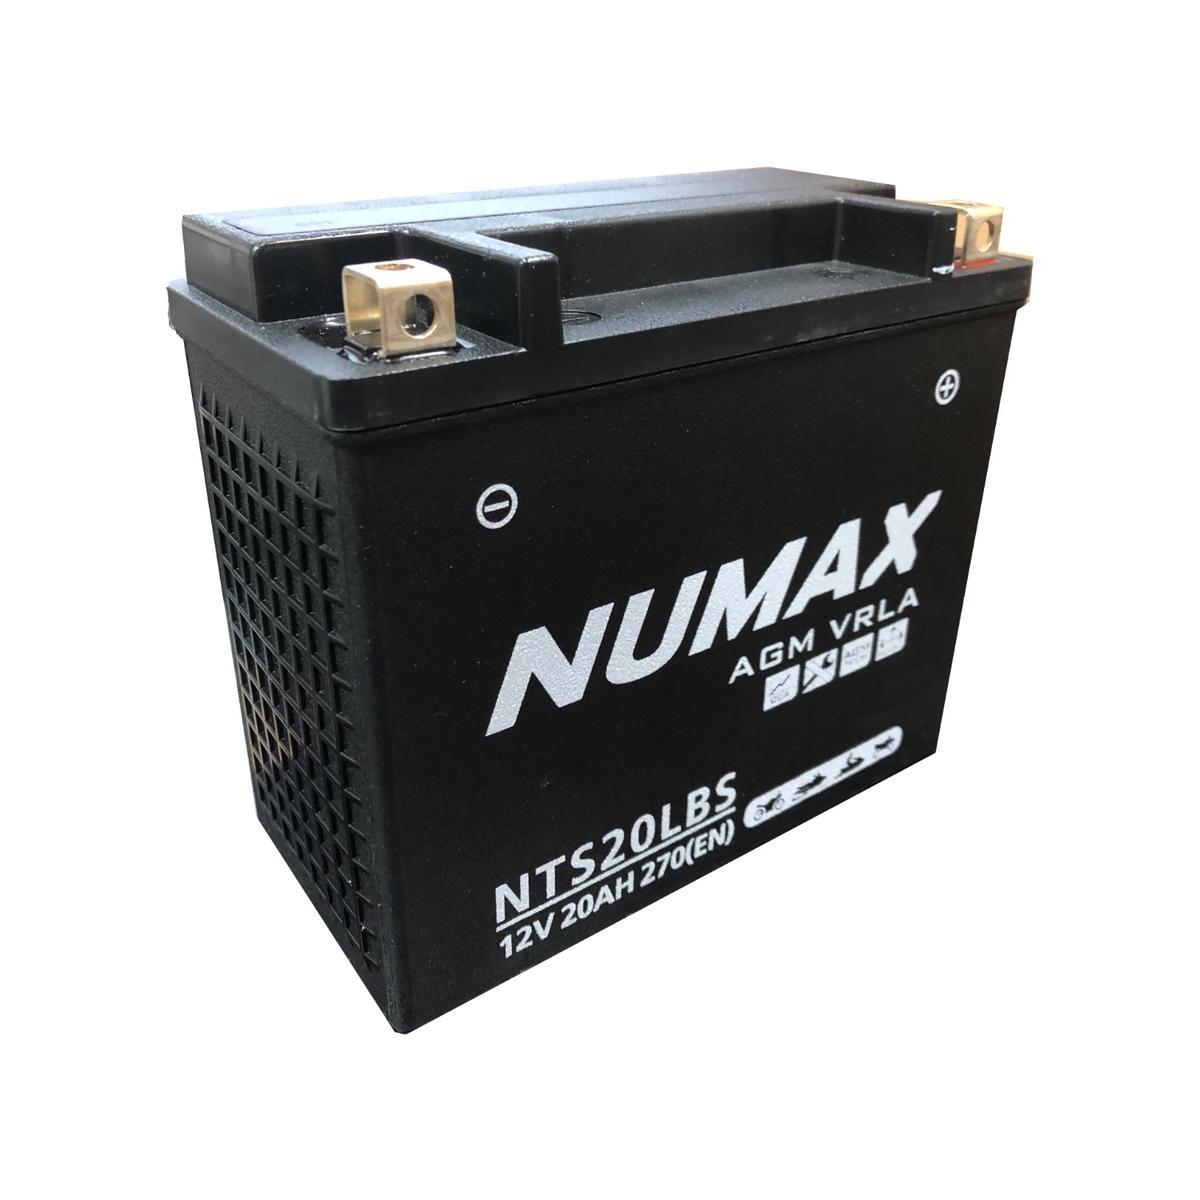 Numax NTS20LBS Motorbike Motorcycle Battery KAWASAKI 1100cc ZX1000A Concours YTX